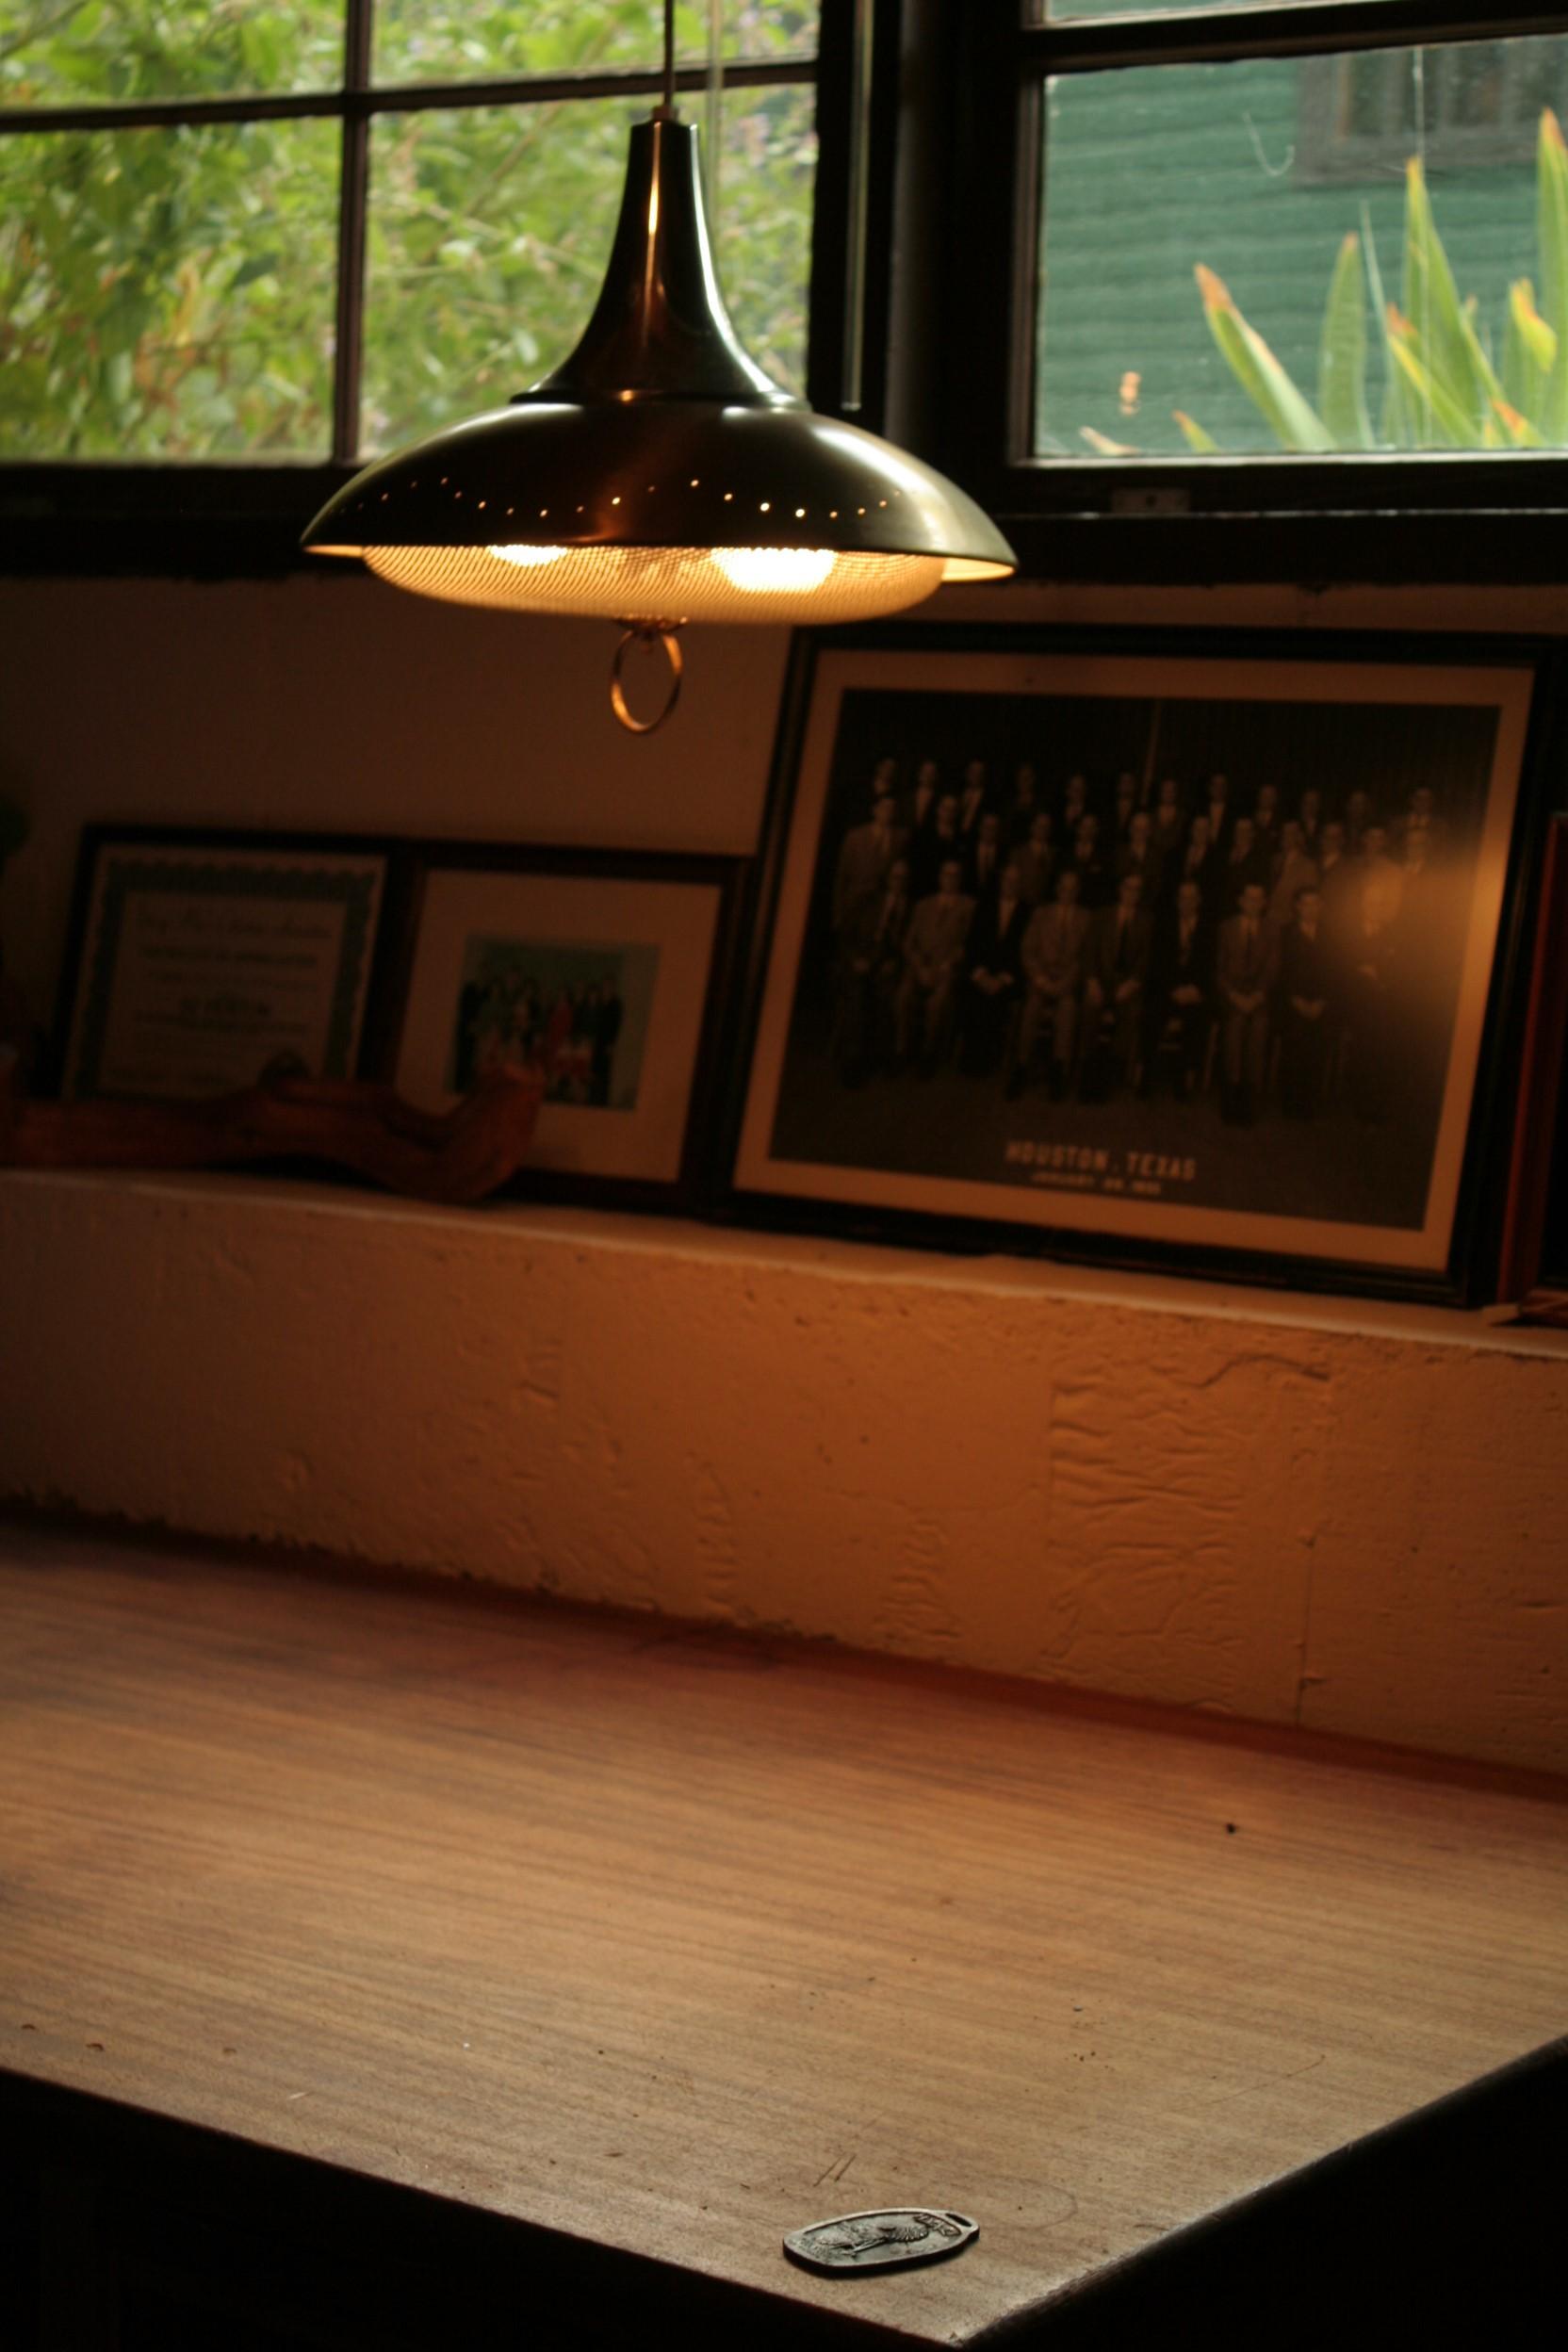 Living in the light. PC: Susan Macias